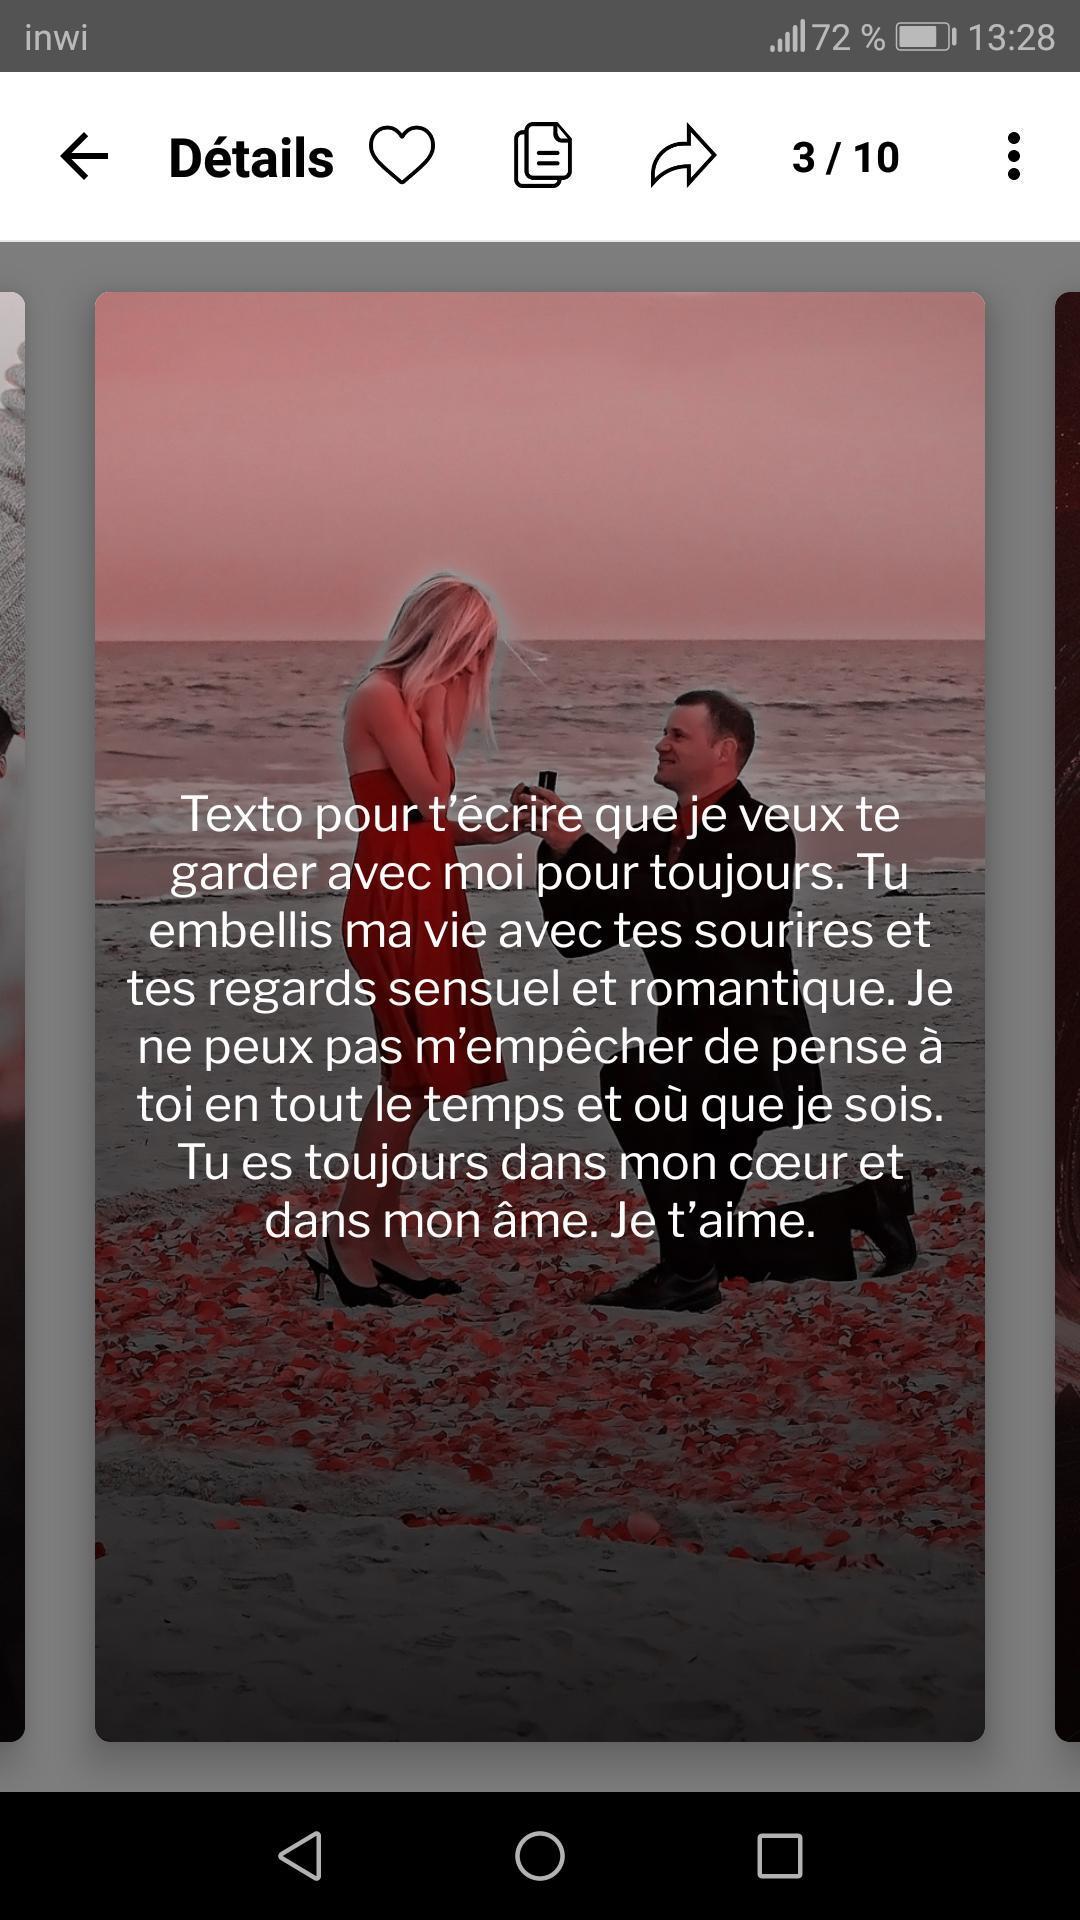 Sms Damour Les 1000 Plus Beaux Sms Romantique For Android